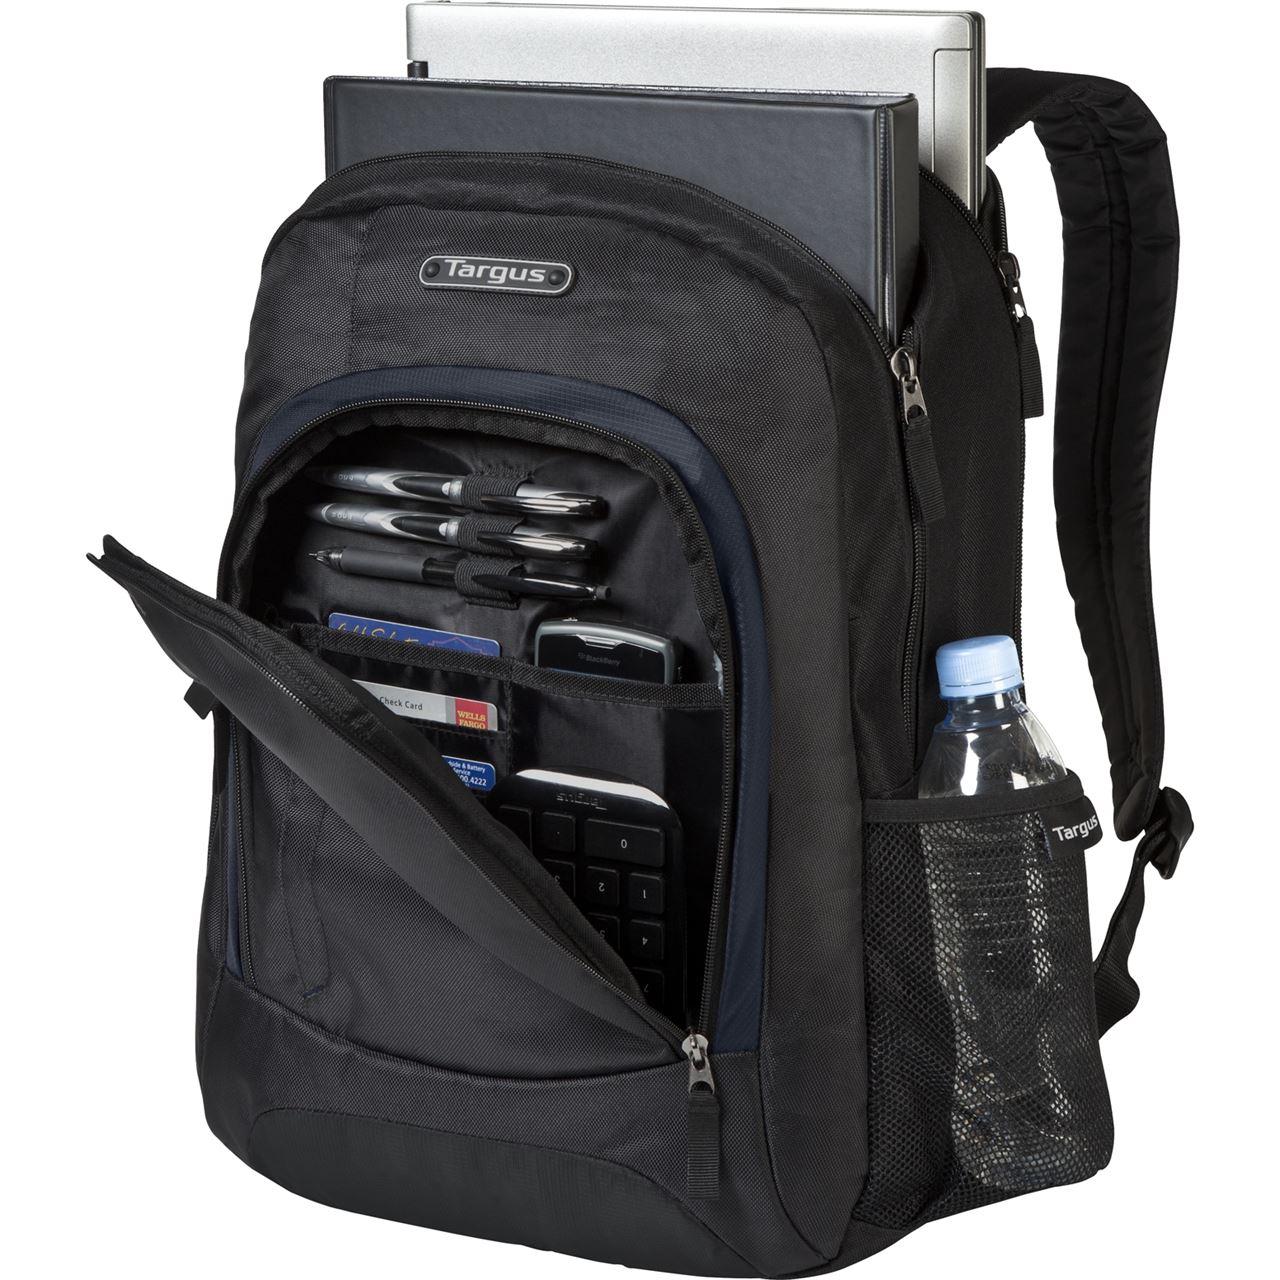 16 urban ii laptop backpack tsb196us black navy backpacks targus. Black Bedroom Furniture Sets. Home Design Ideas